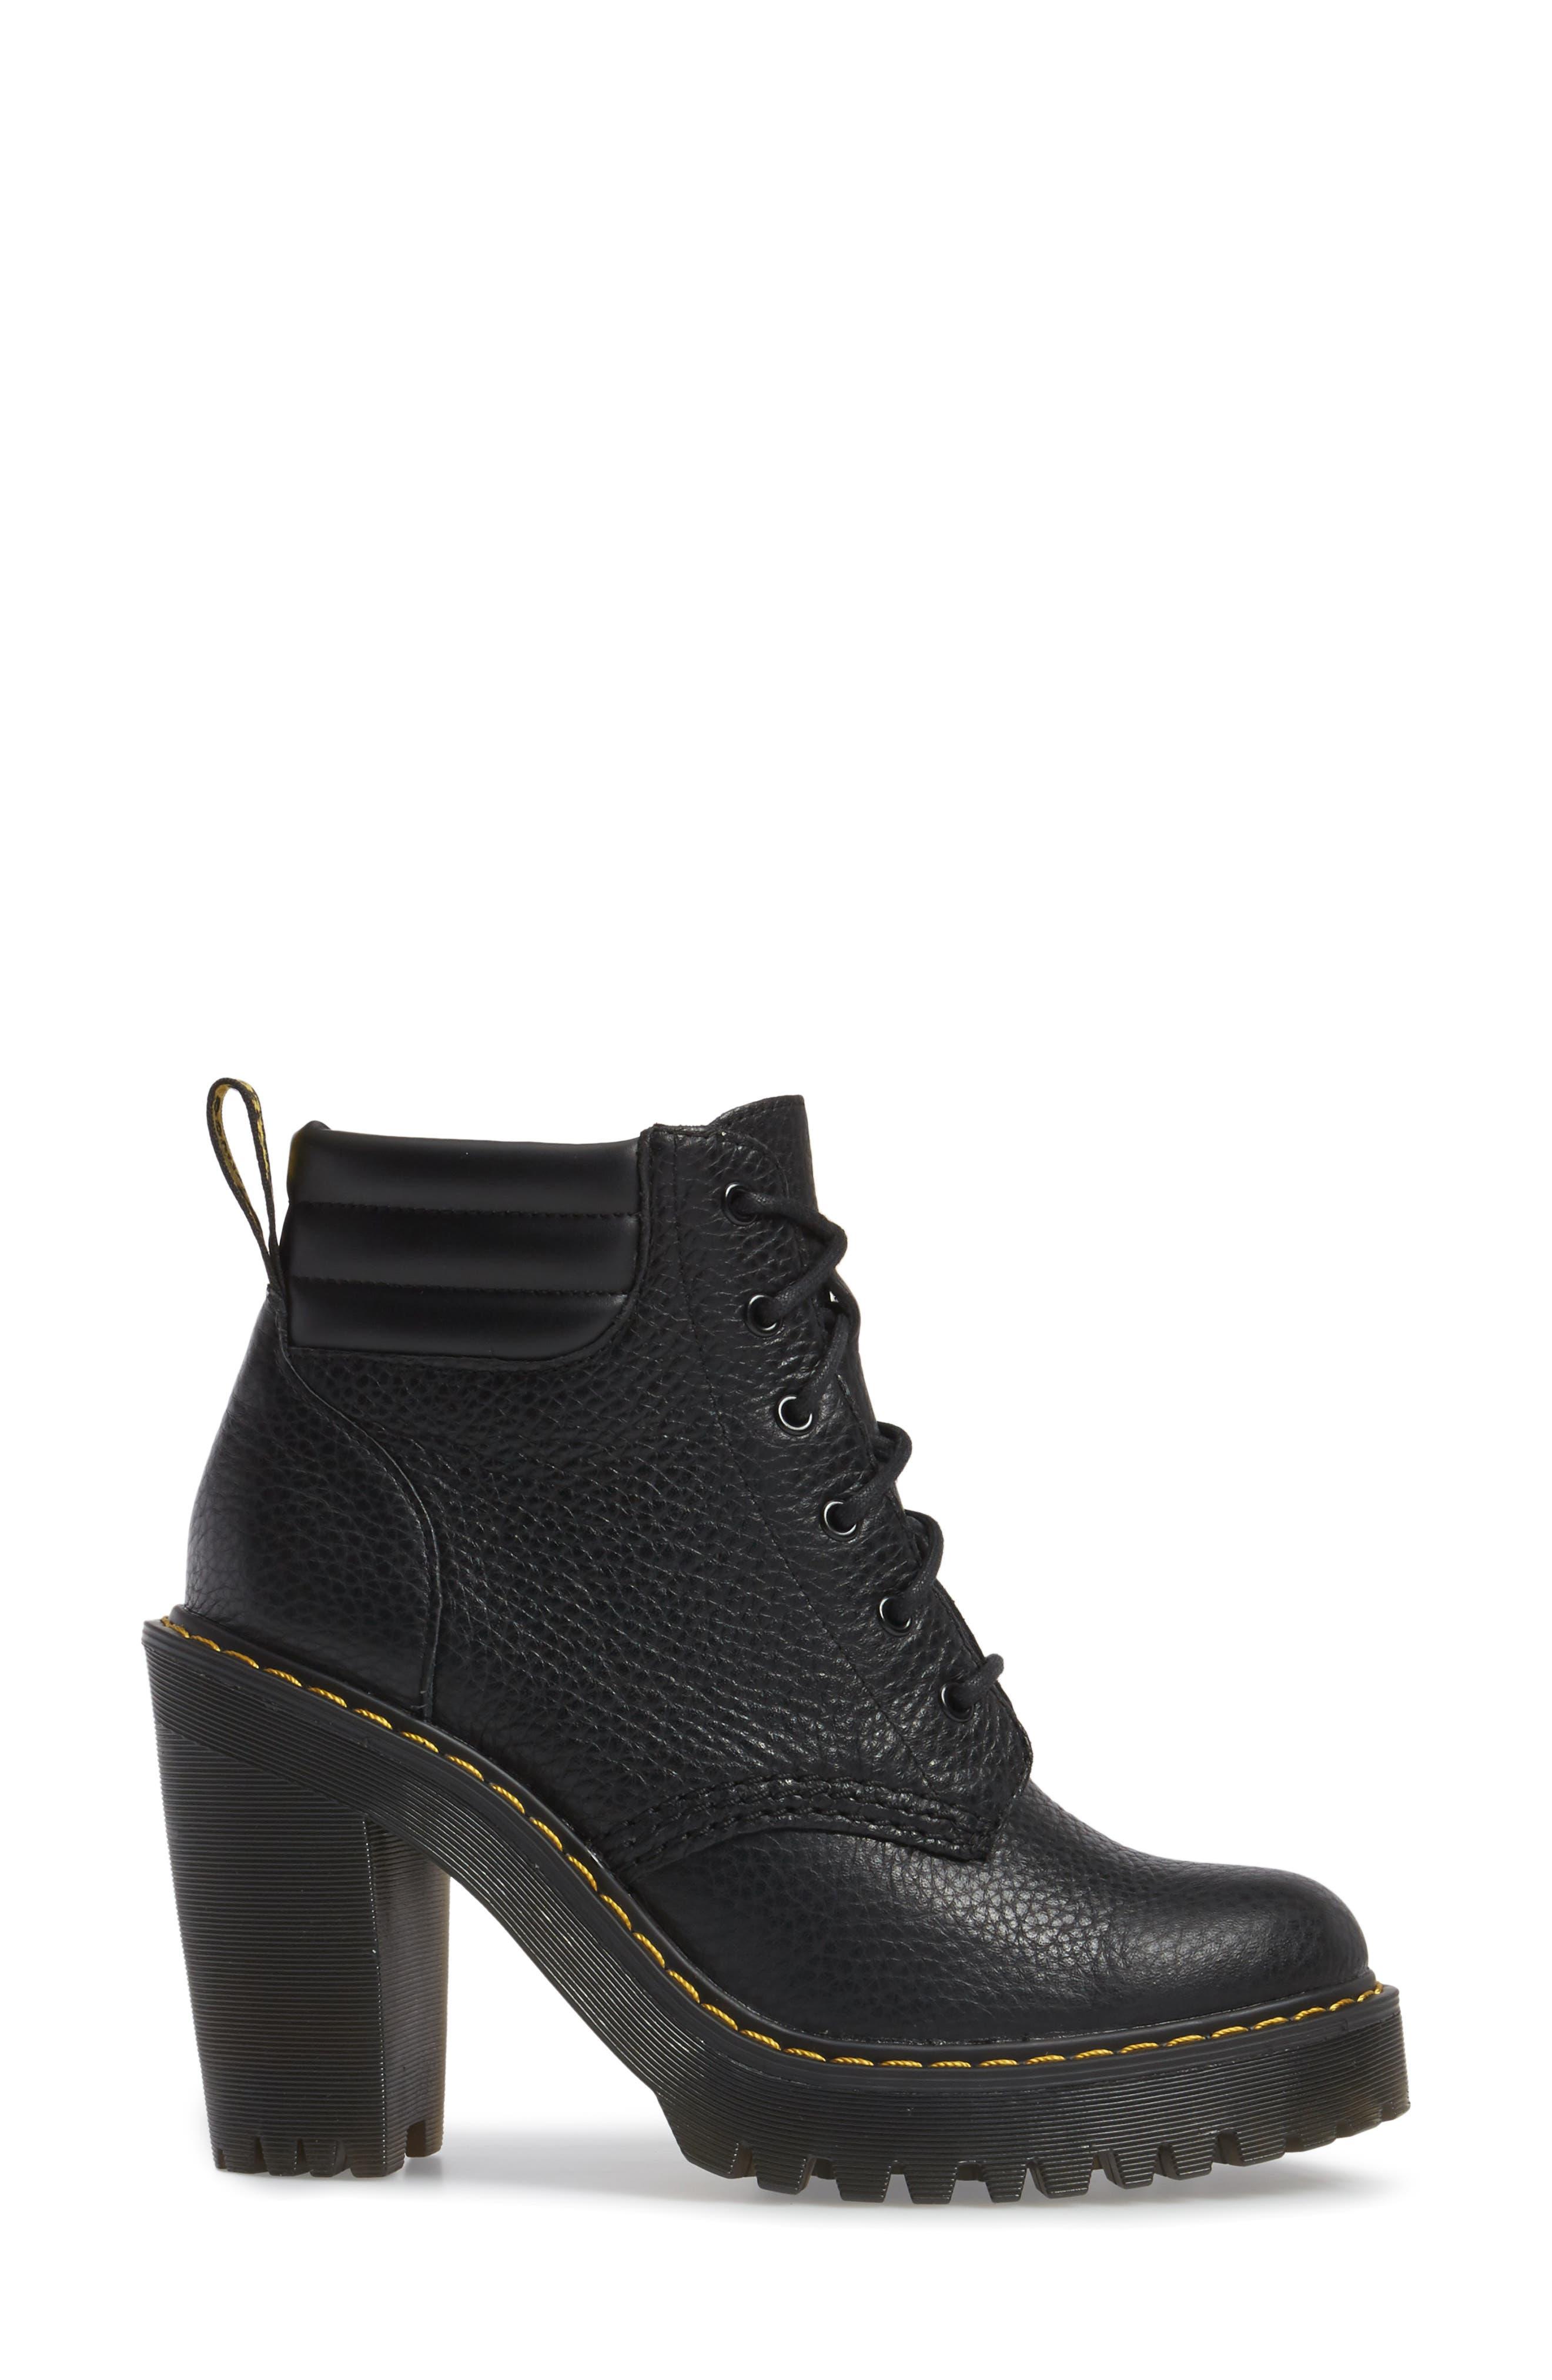 Persephone Platform Boot,                             Alternate thumbnail 3, color,                             Black Leather